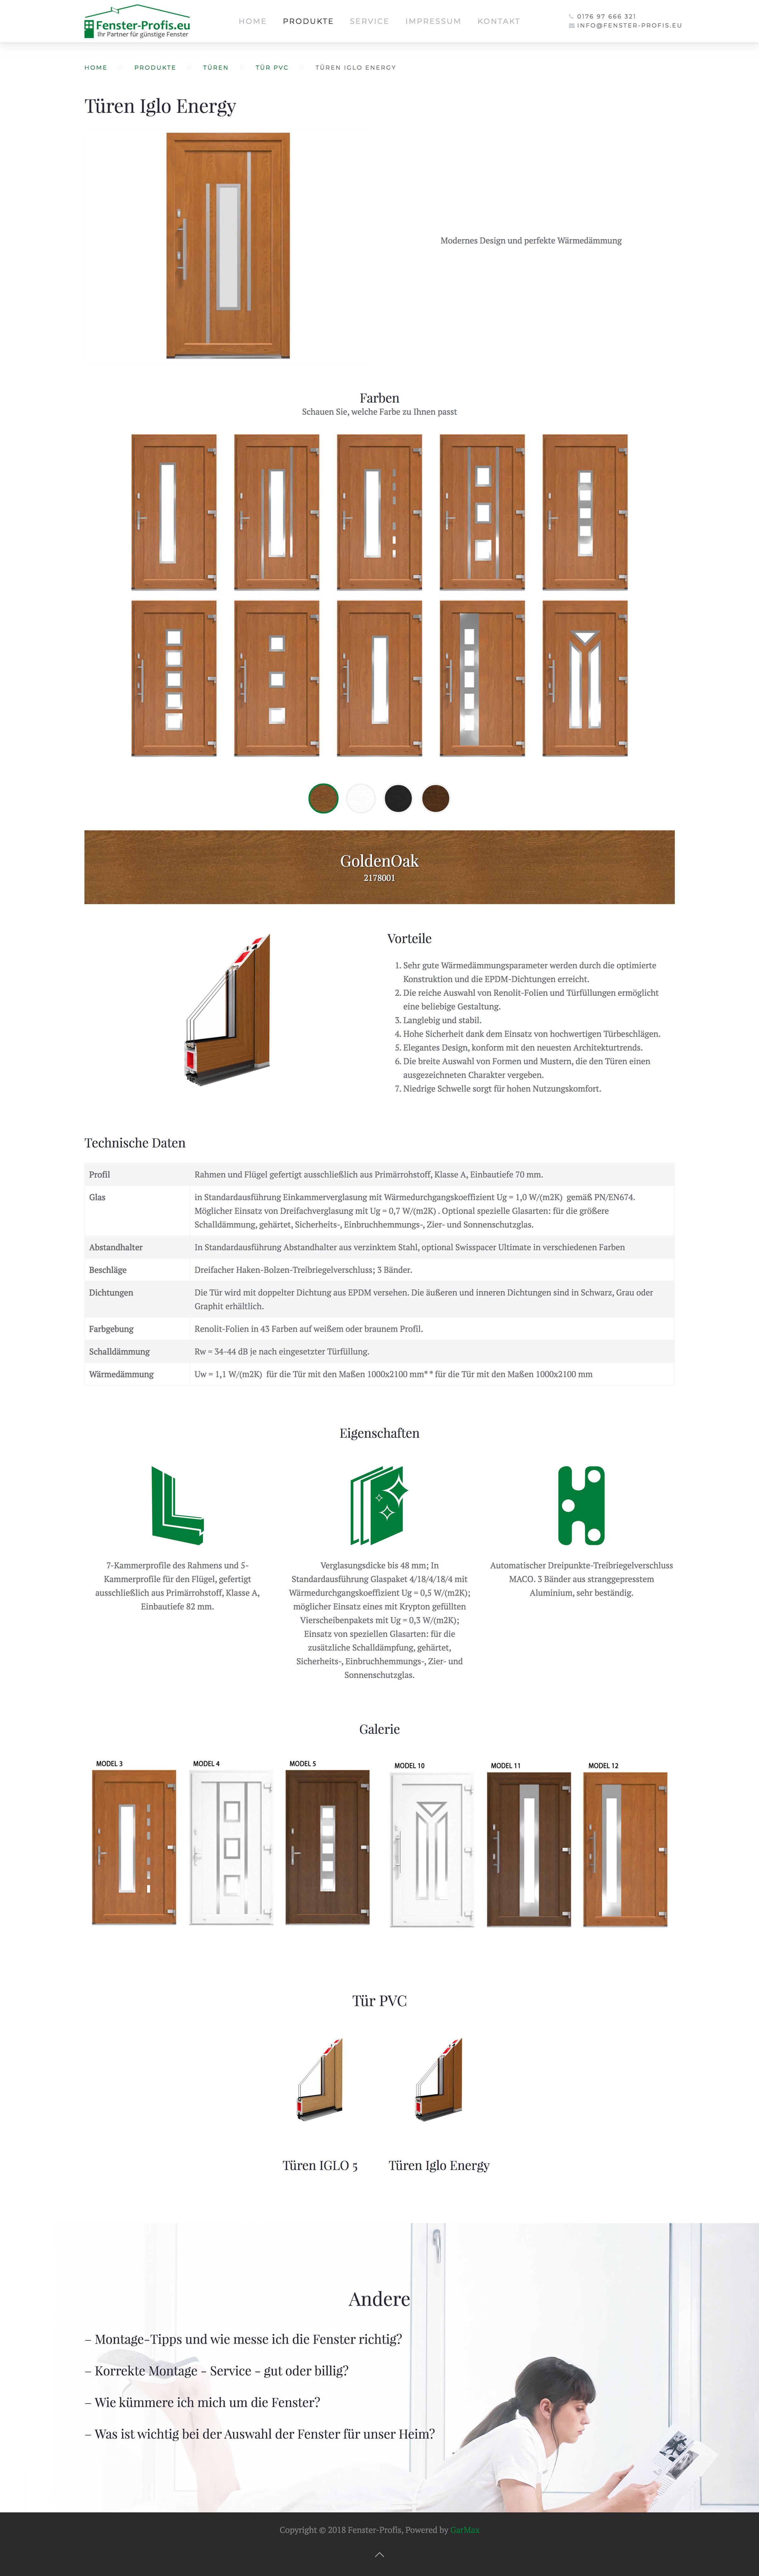 Fenster-Profis - Produkt 2